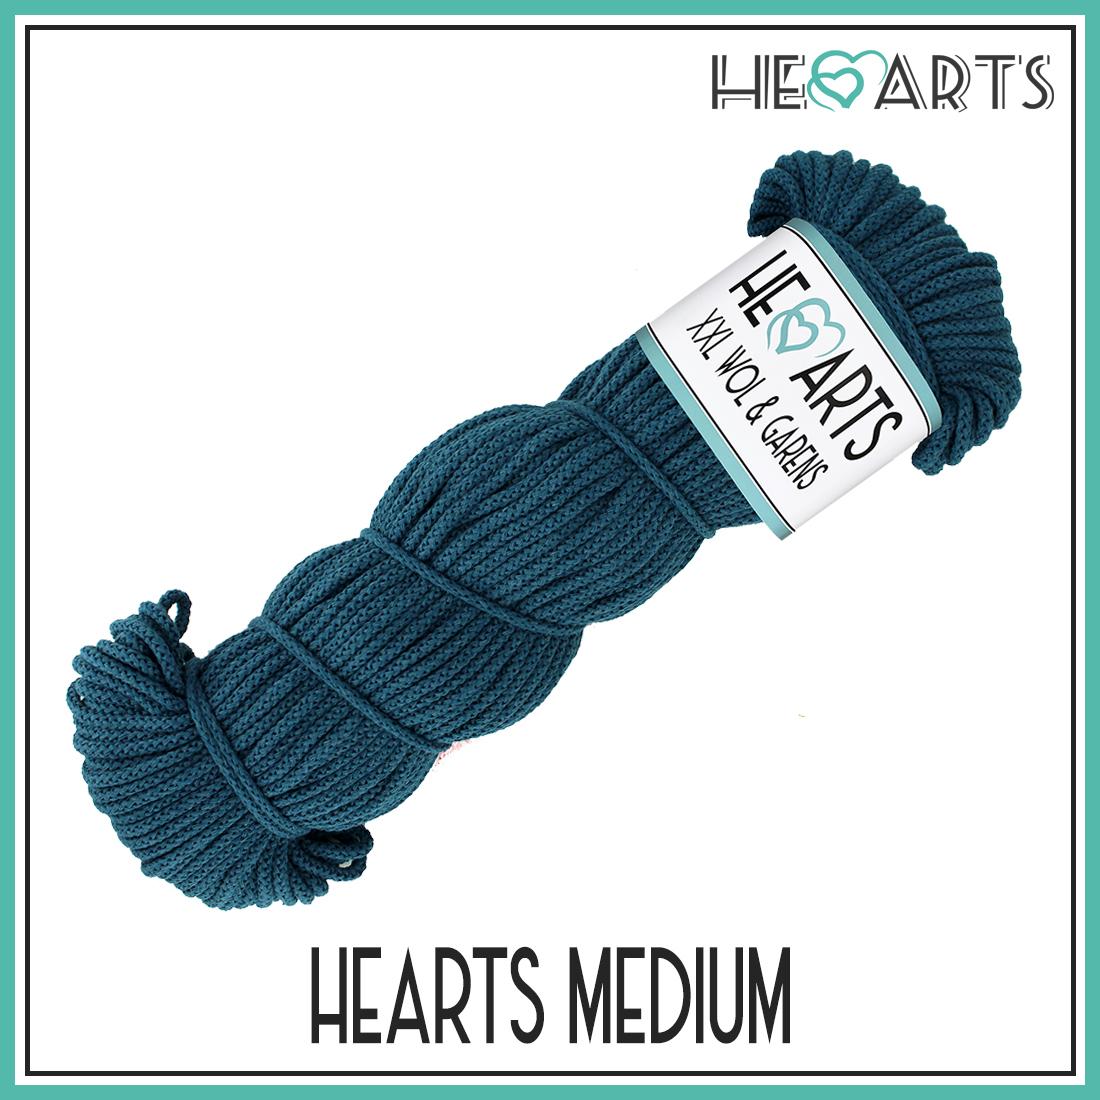 hearts medium katoen